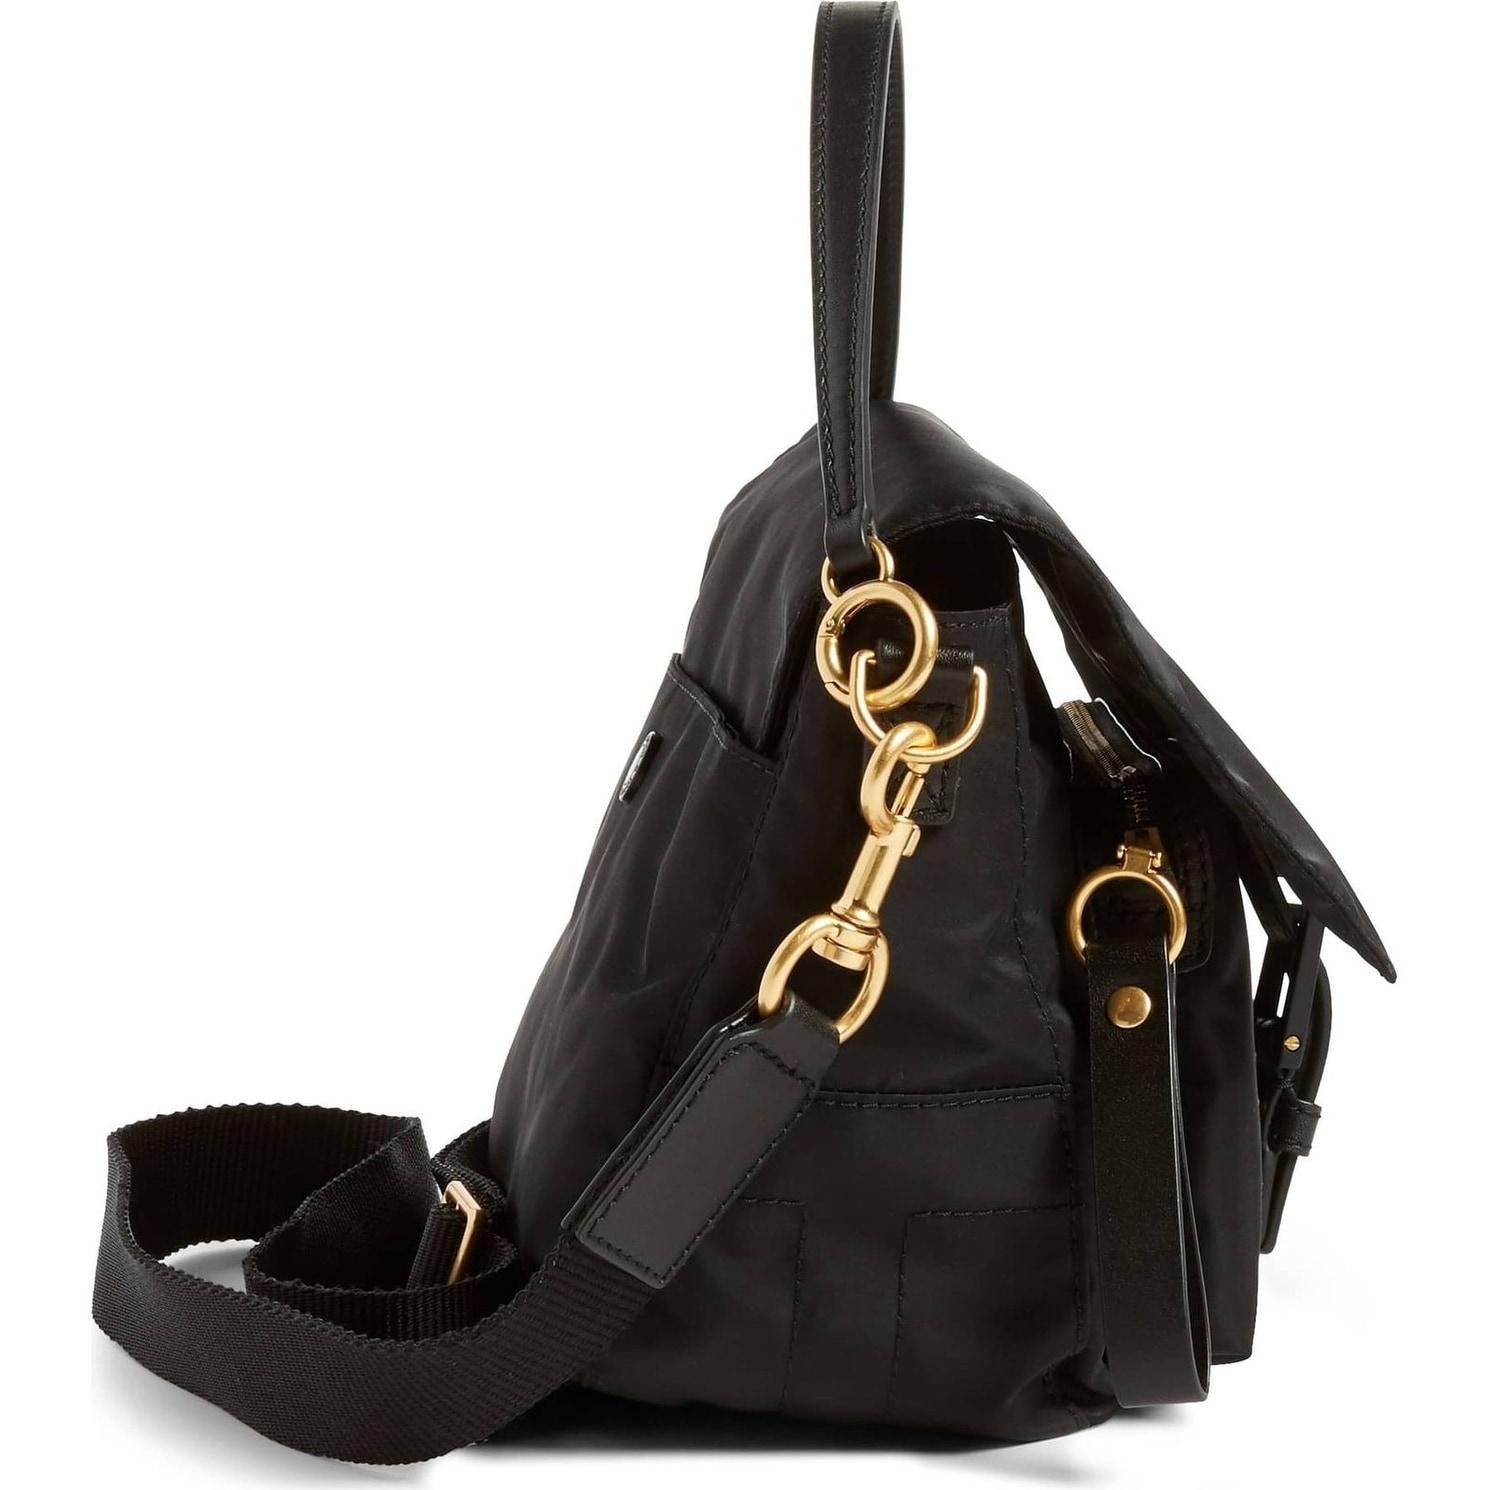 2faac0d040c3 Shop Tory Burch Tilda Nylon Crossbody Bag Black - Free Shipping Today -  Overstock - 23449864